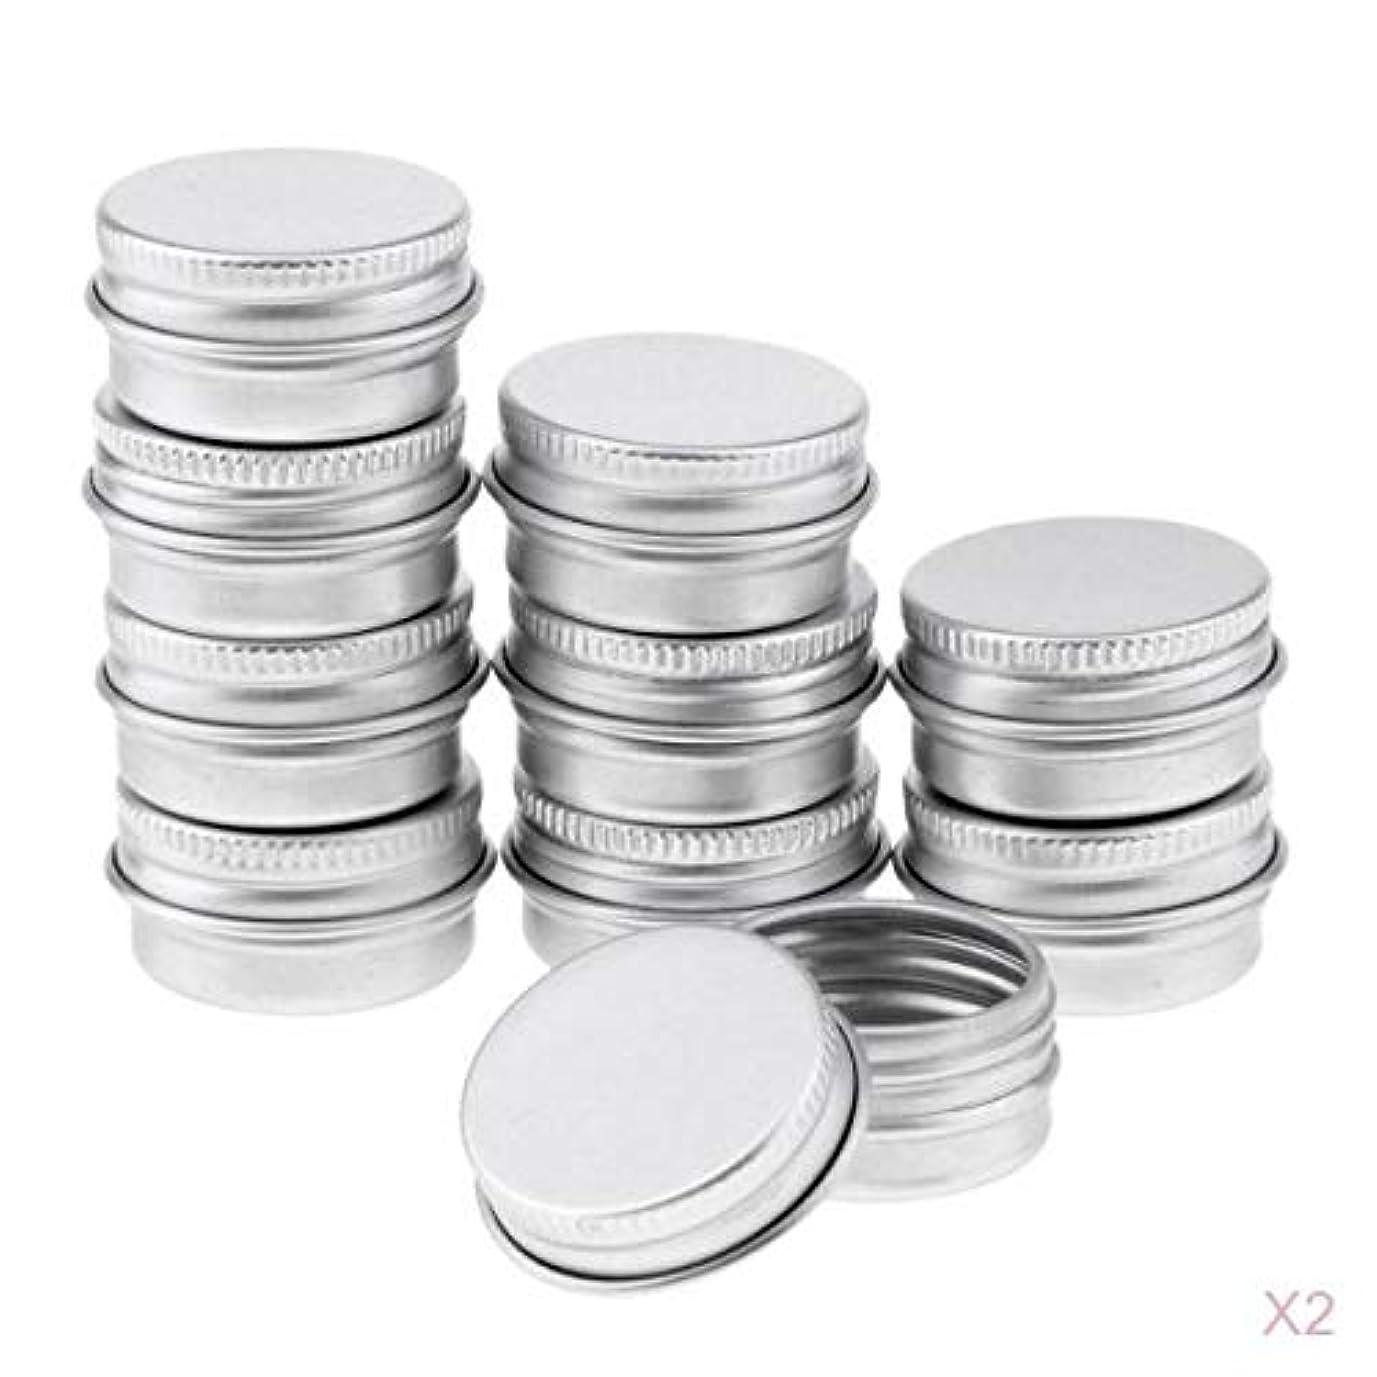 P Prettyia 約20個 メイクアップジャー 5g アルミ缶 化粧品 コスメ 小分け容器